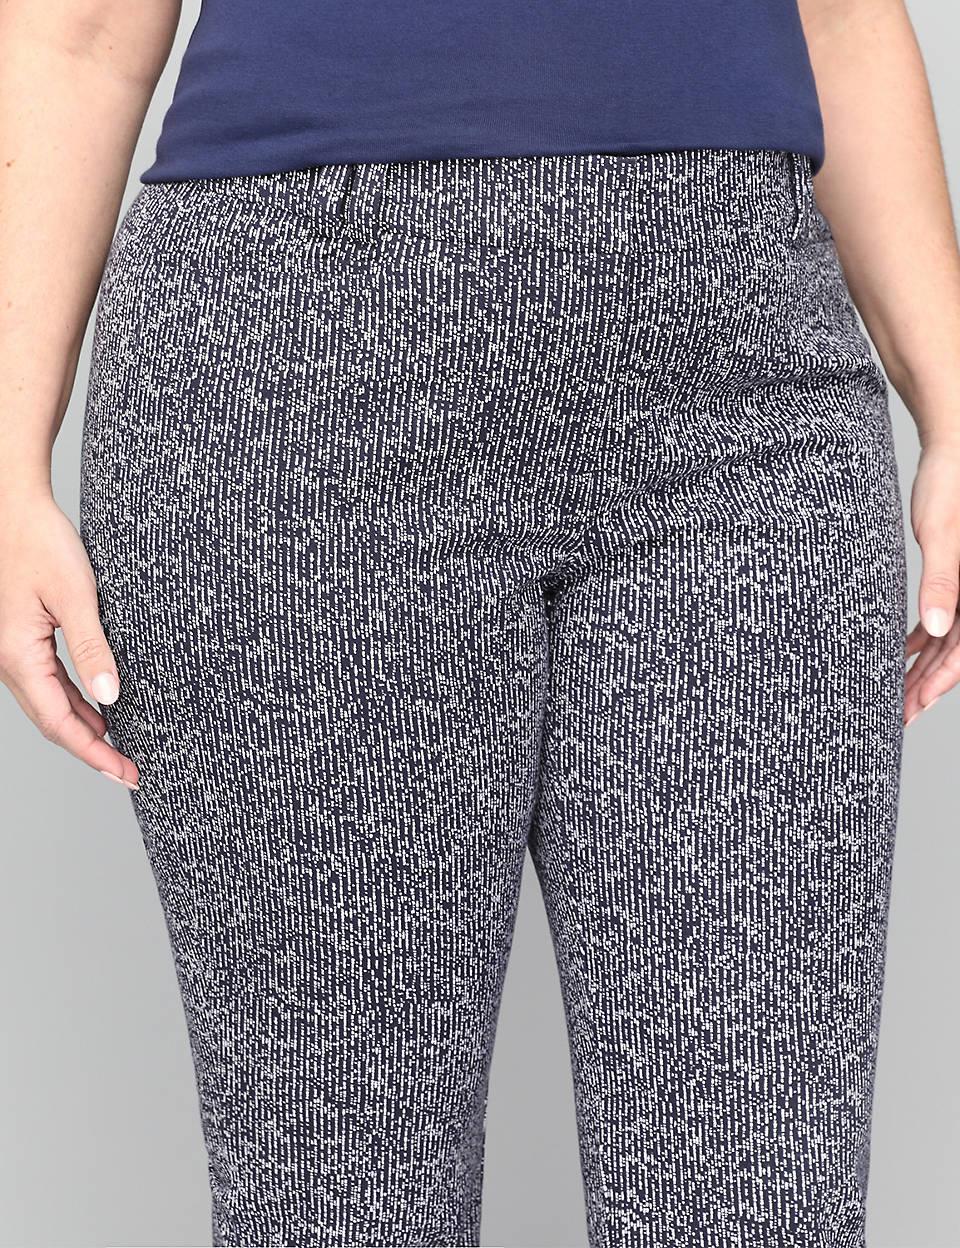 6002b20d60a1 Allie Smart Stretch Crop Pant - Print | Lane Bryant